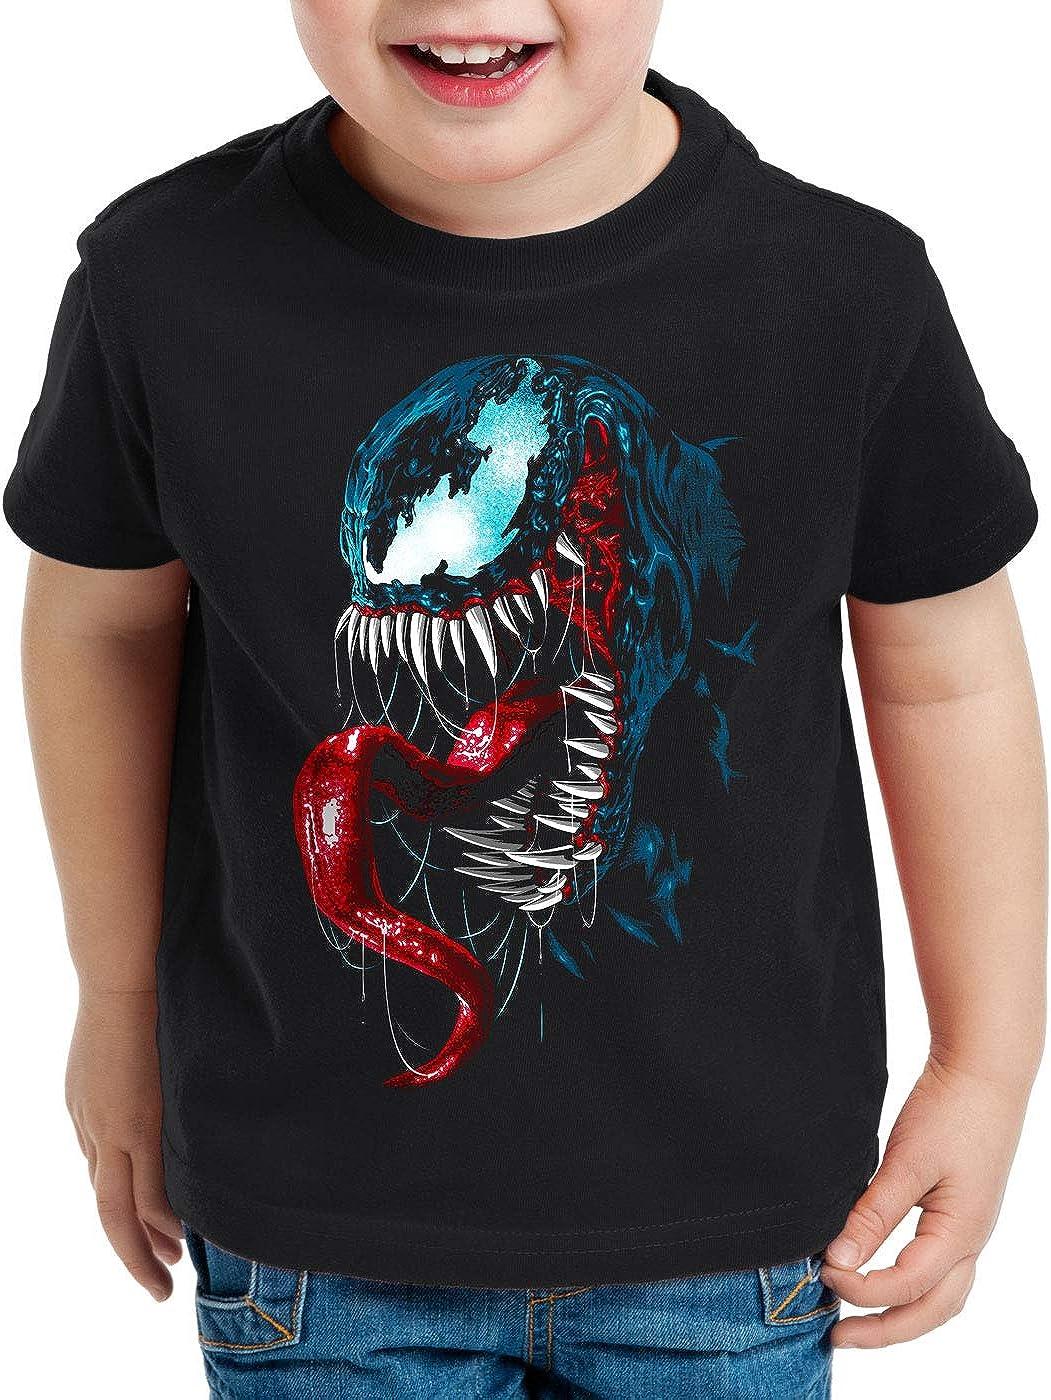 style3 Haze T-Shirt per Bambini e Ragazzi Eddie Brock Comic Cinema